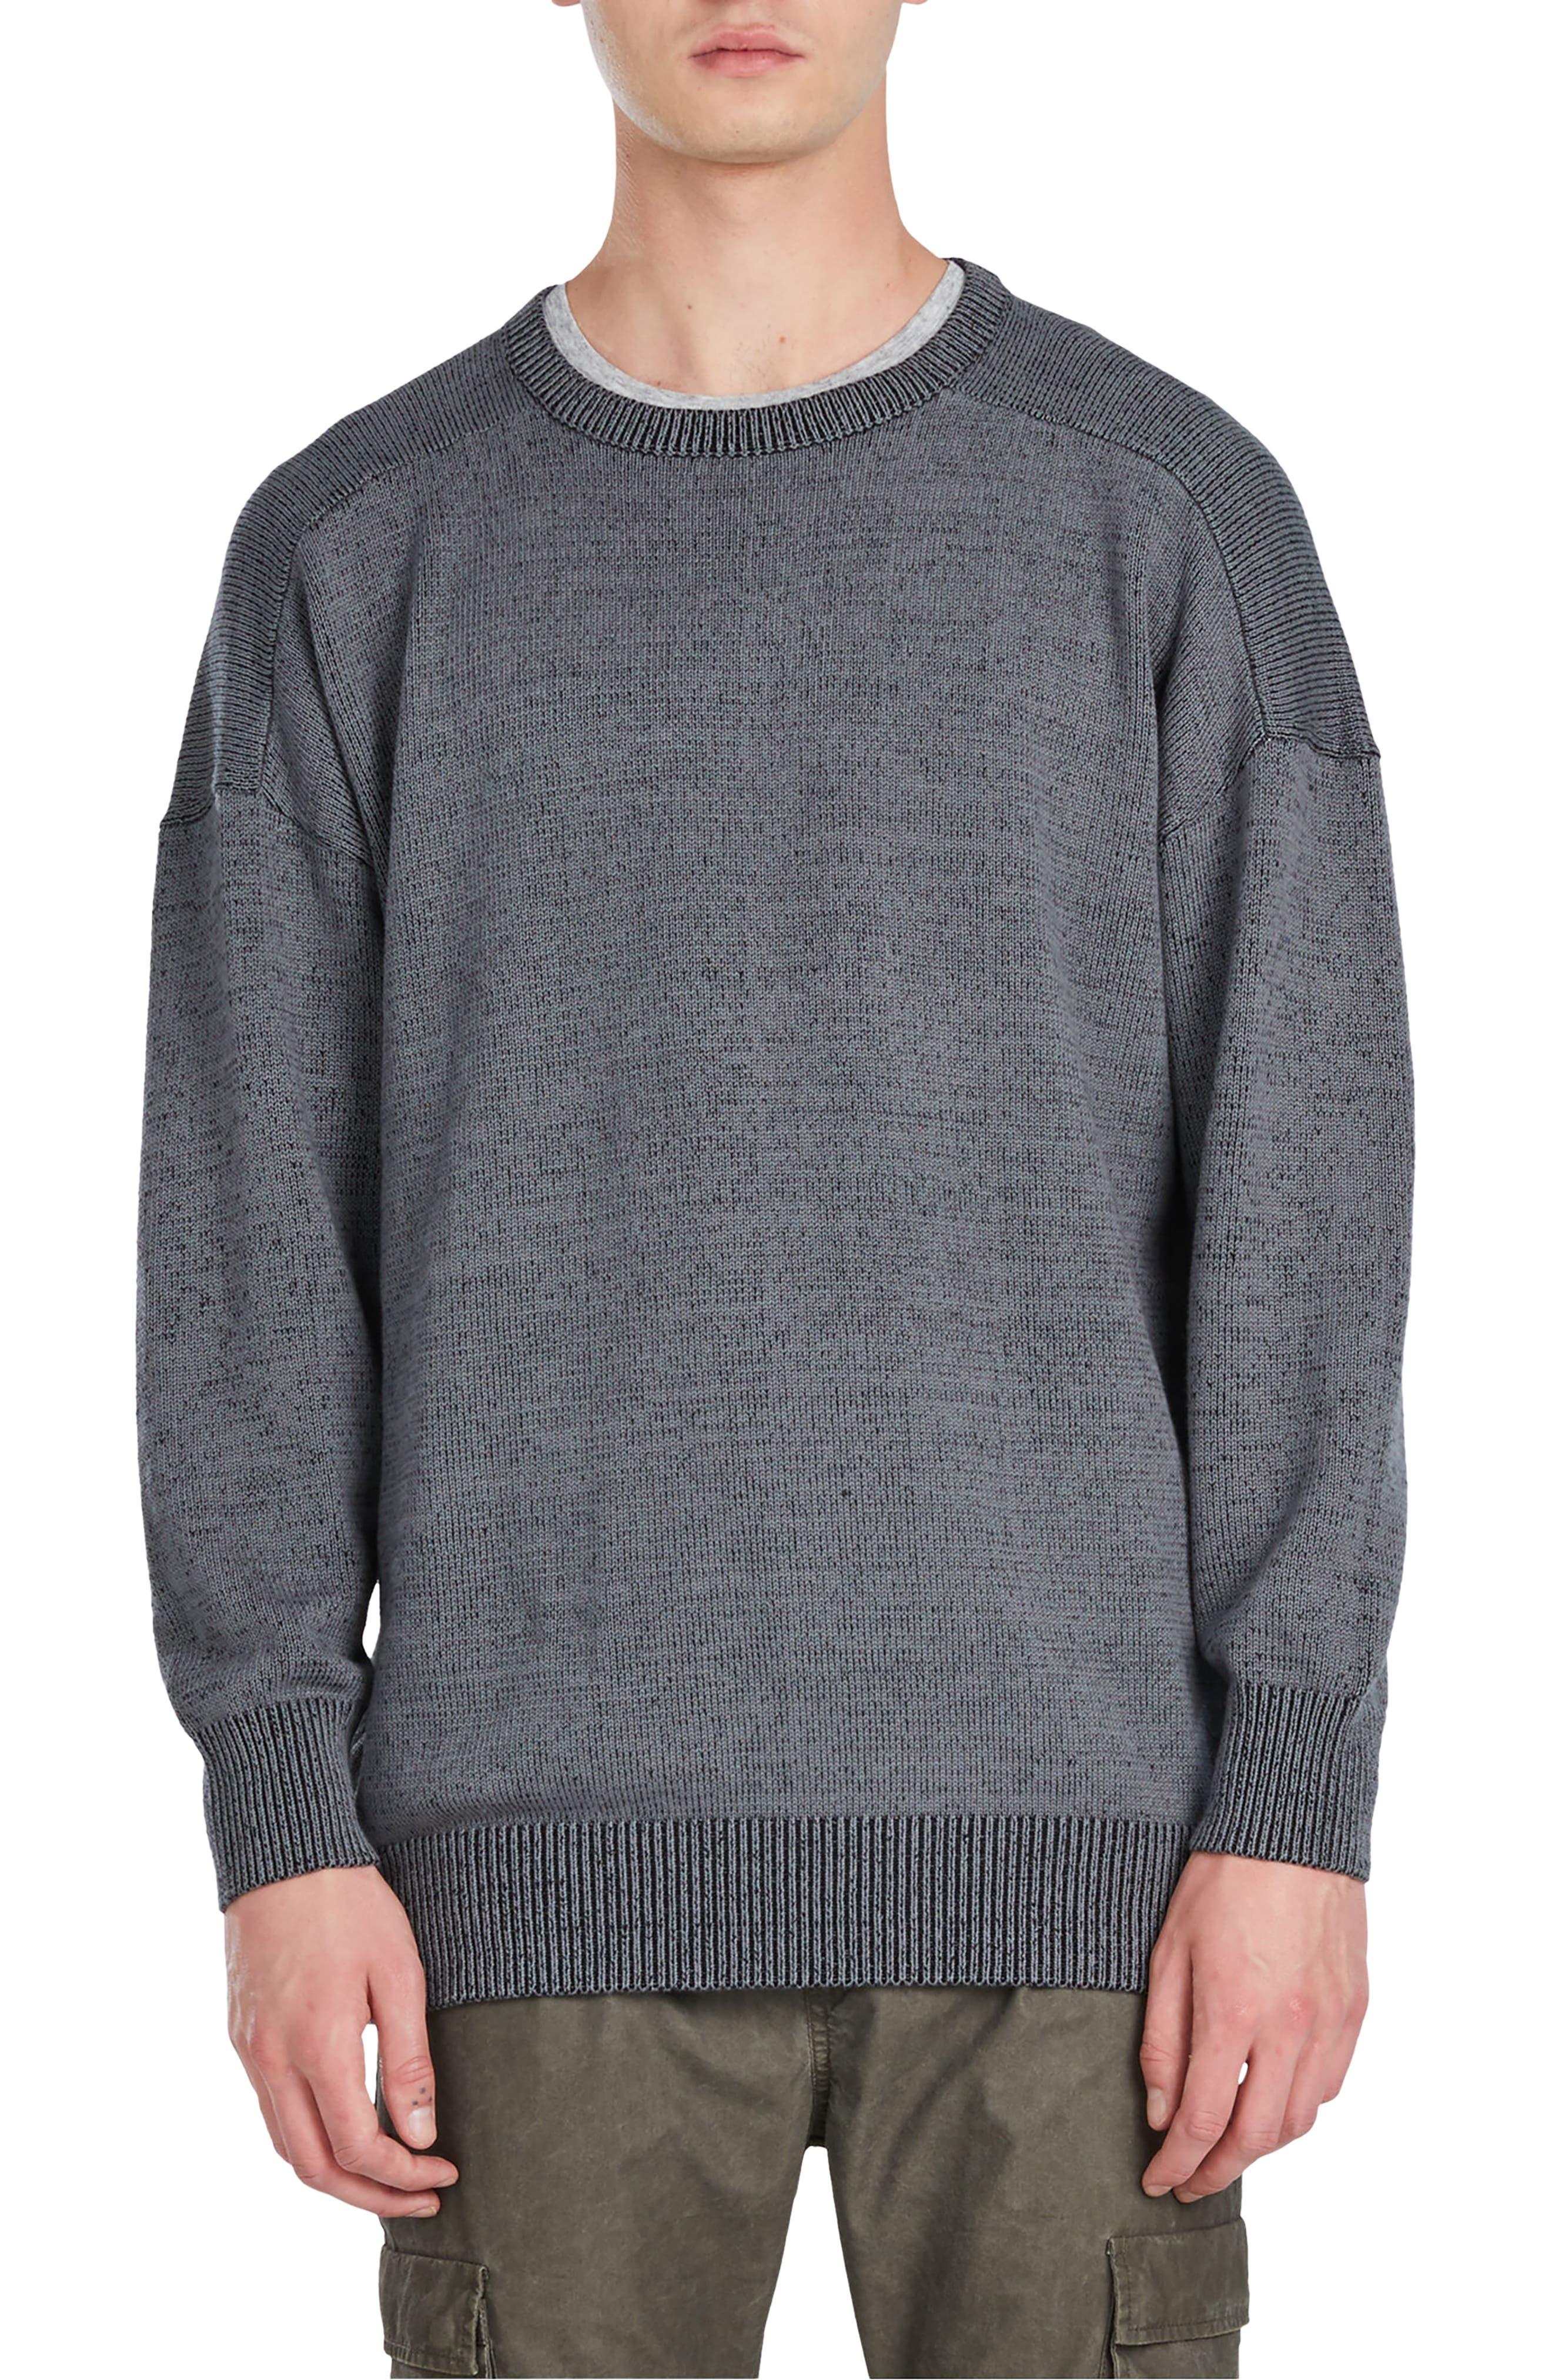 Cotch Knit Sweater,                         Main,                         color,